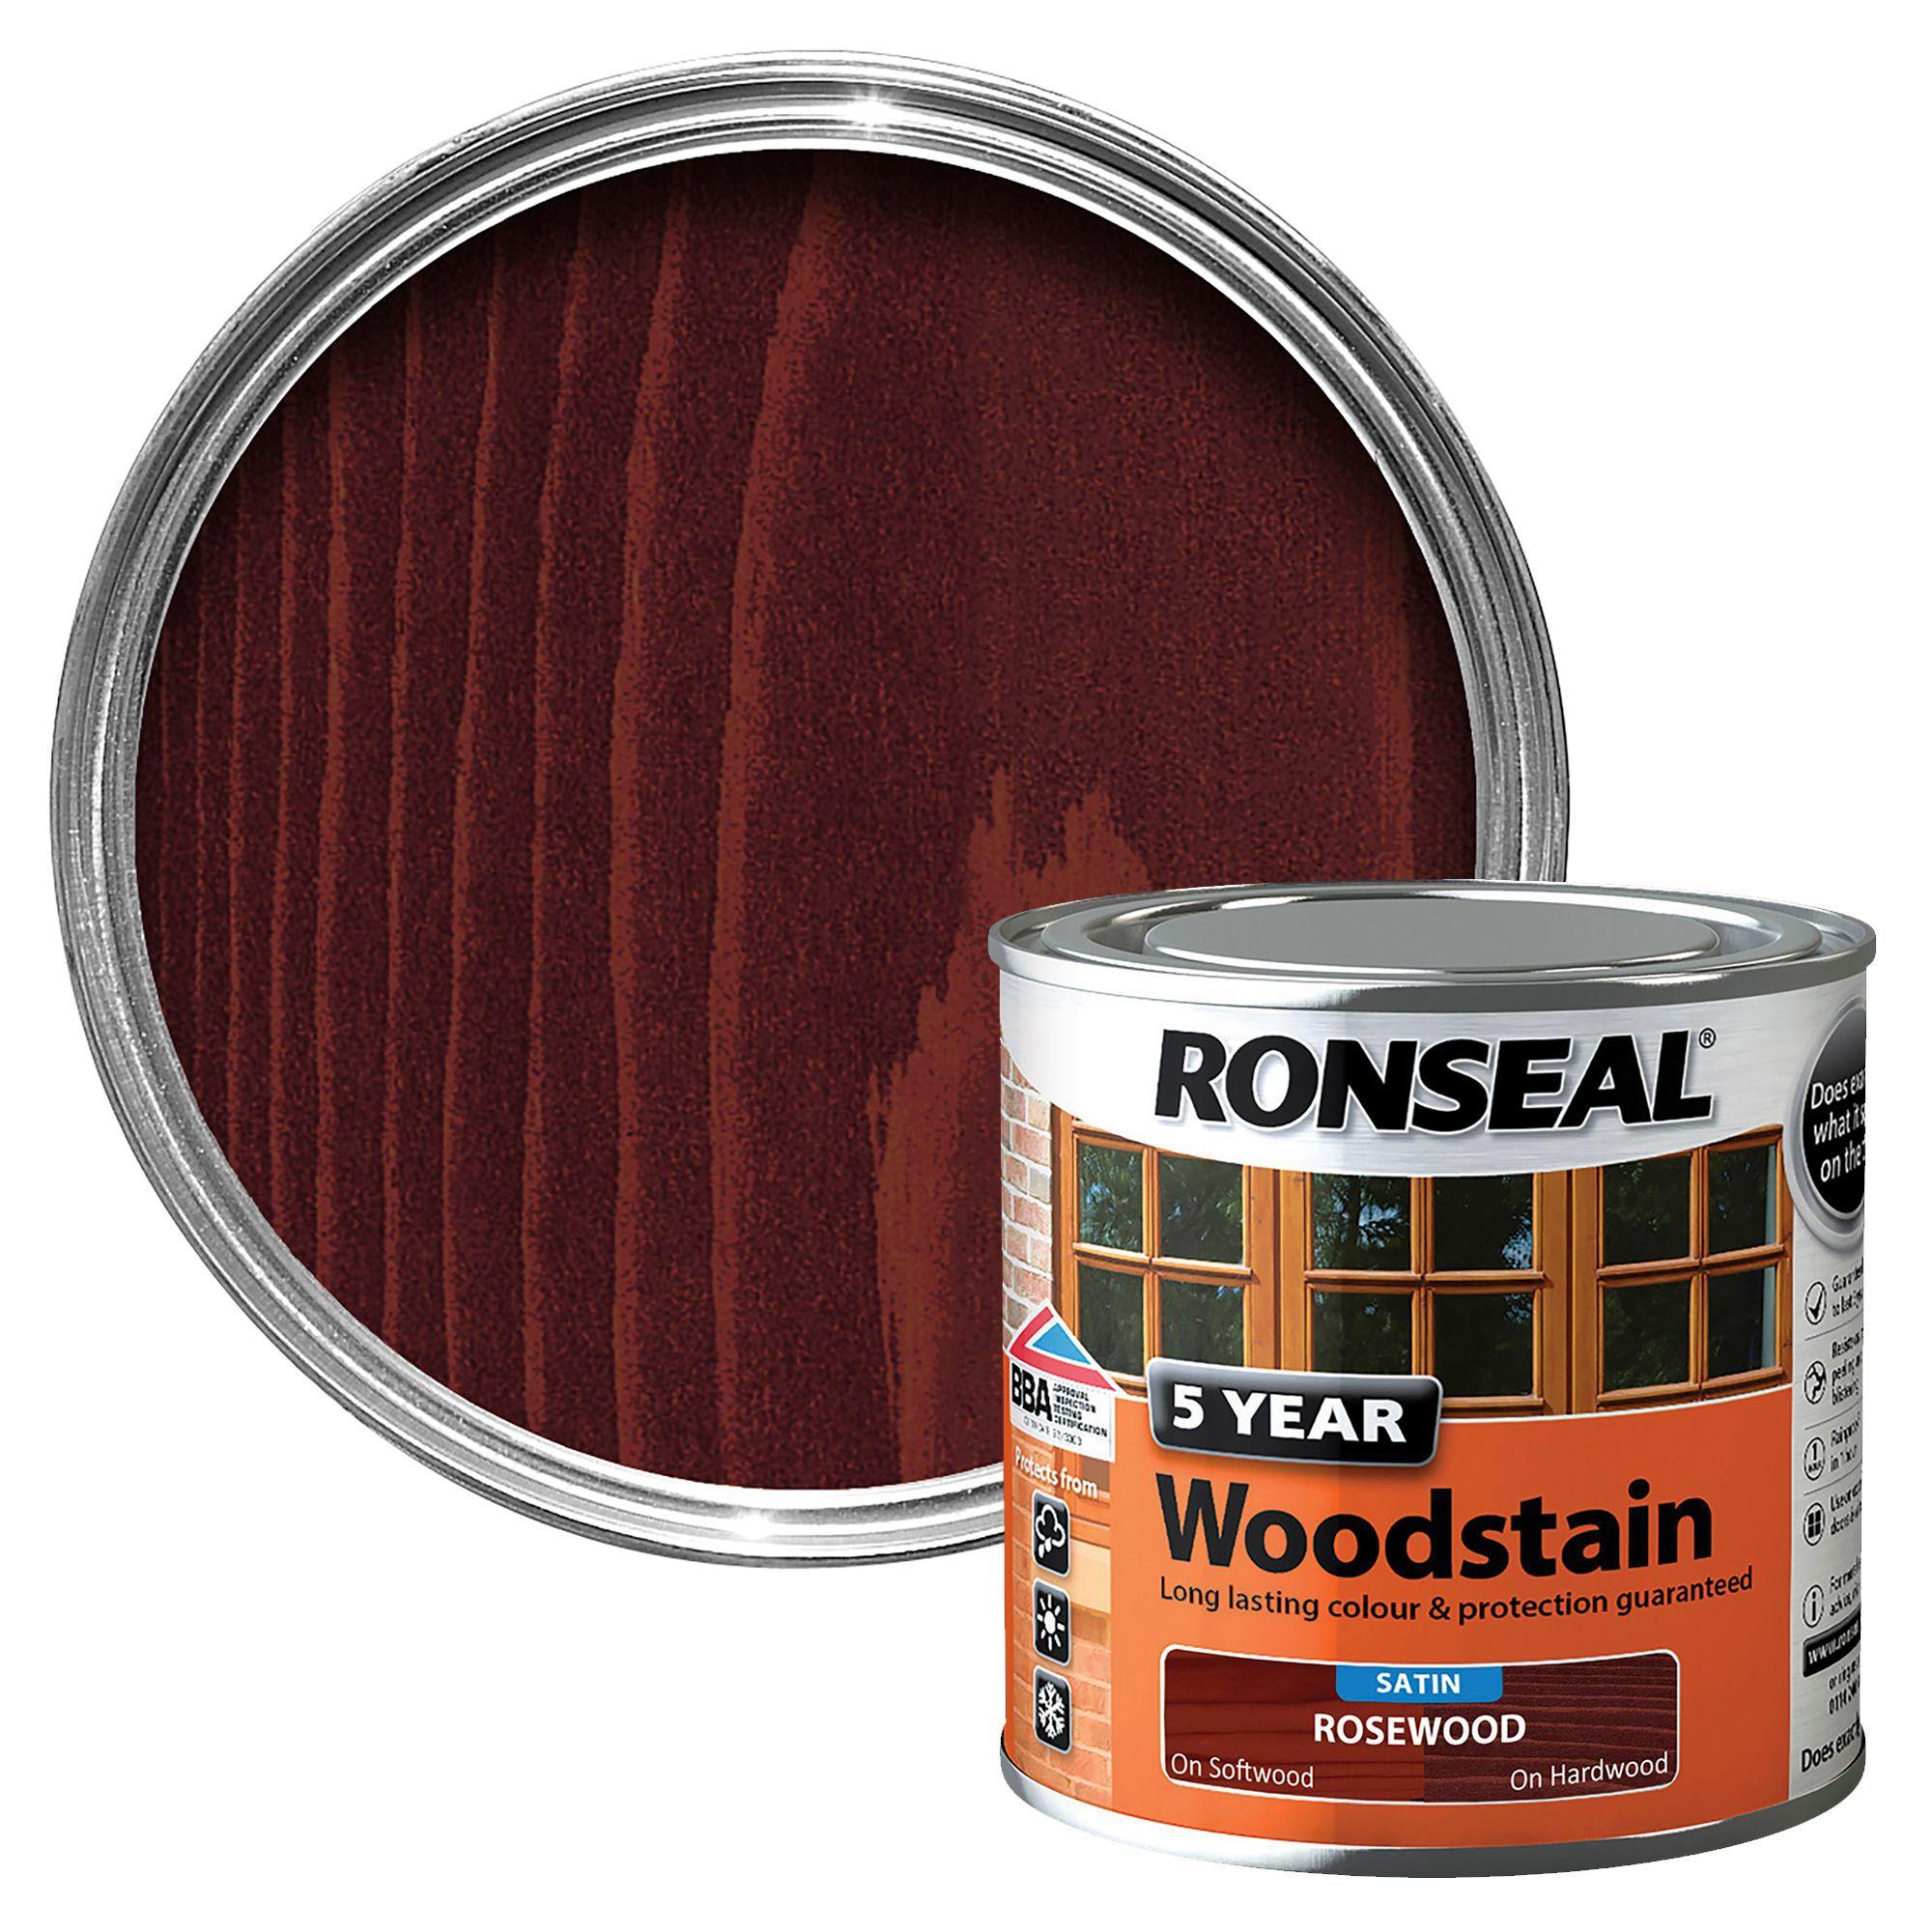 Ronseal Rosewood High Satin Sheen Woodstain Departments Diy At B Q